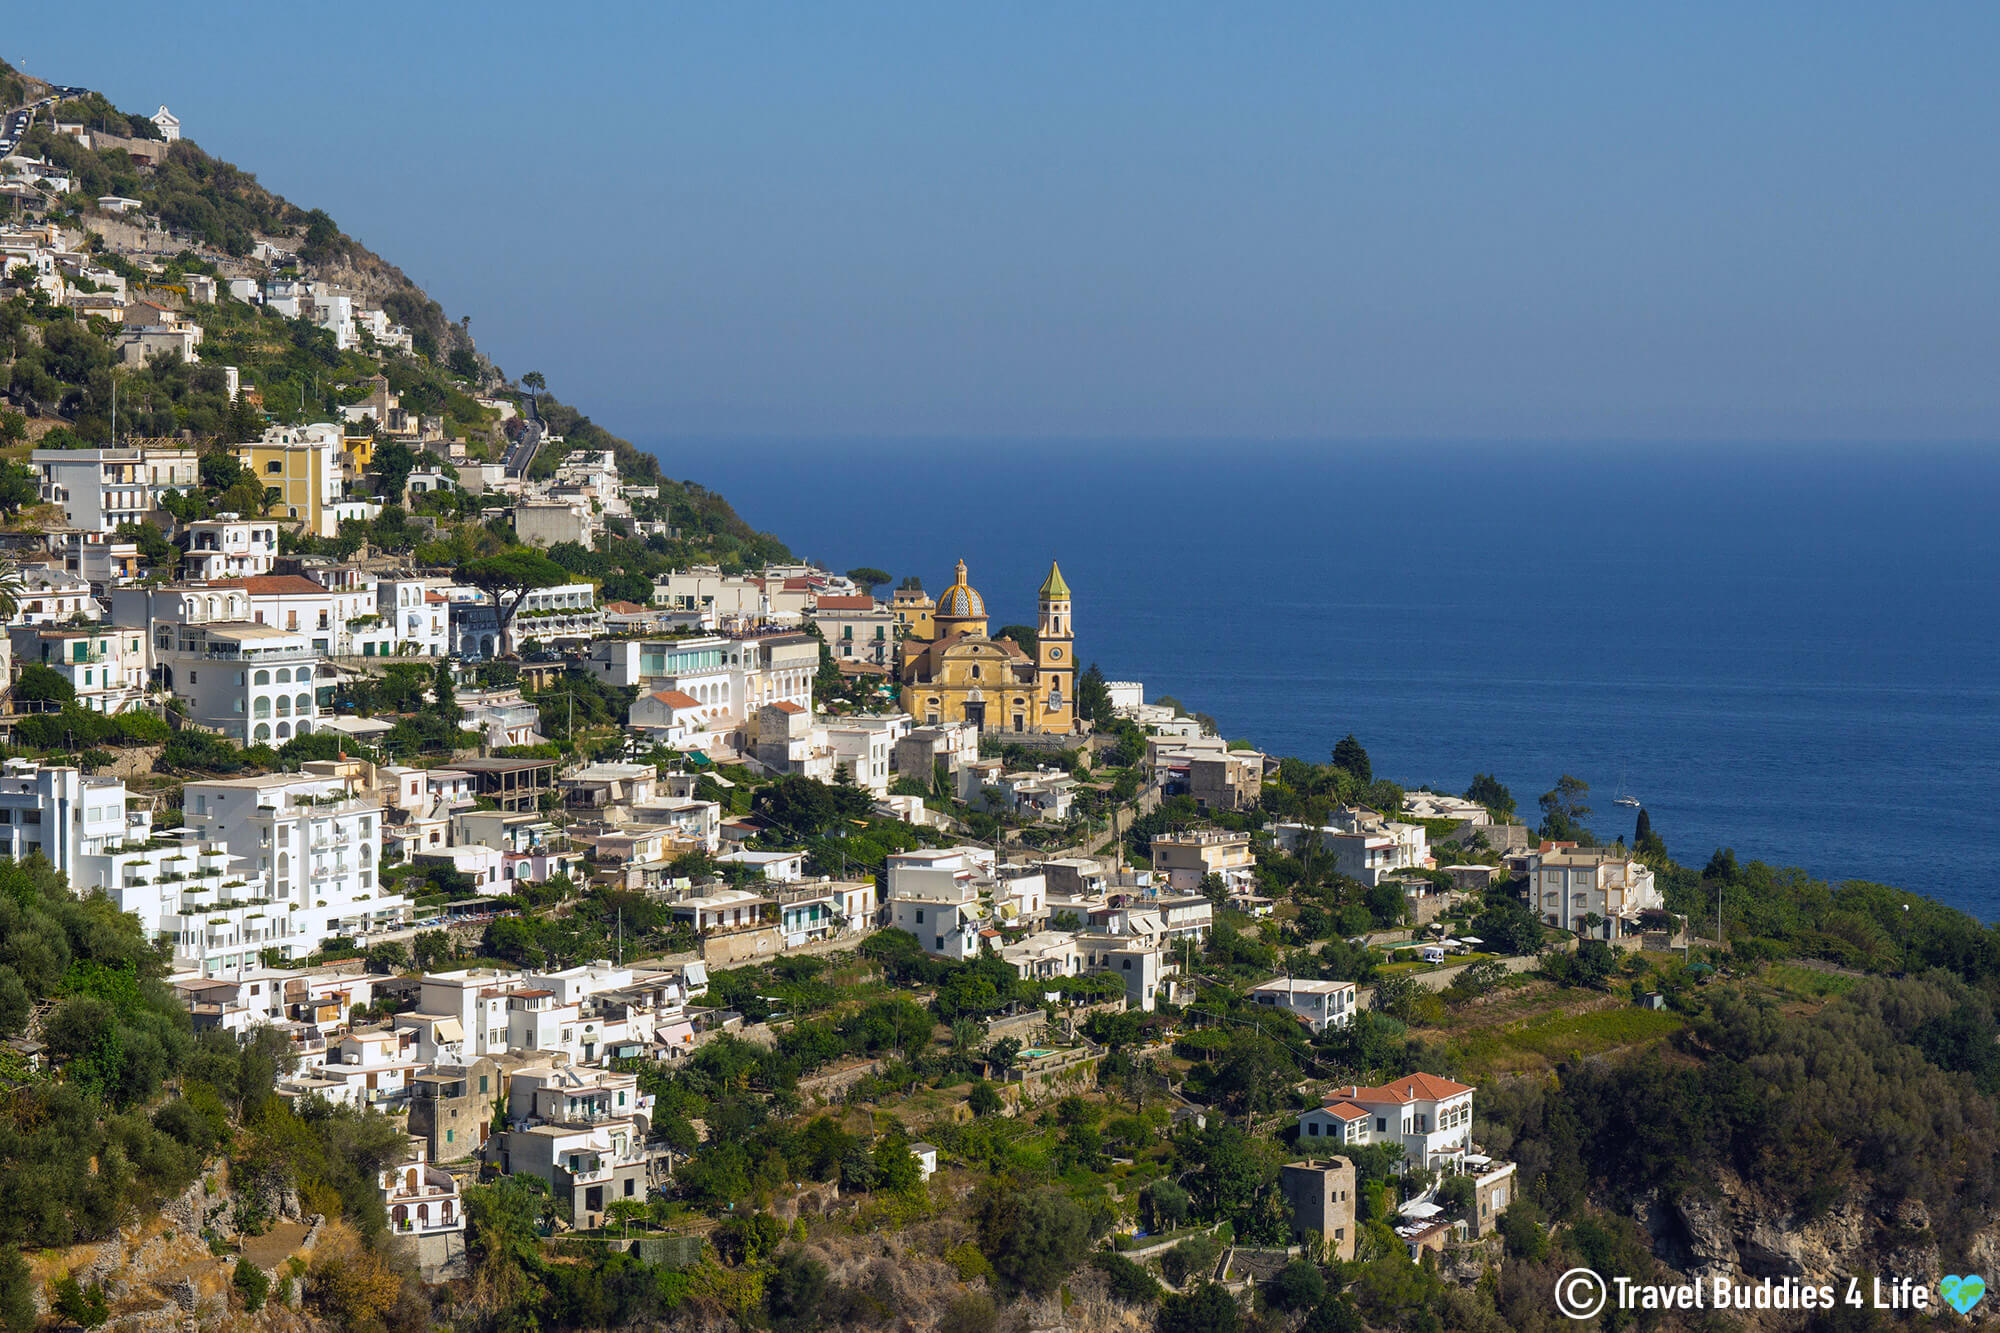 The Tip Of Sorrento Near The Amalfi Coast In Italy